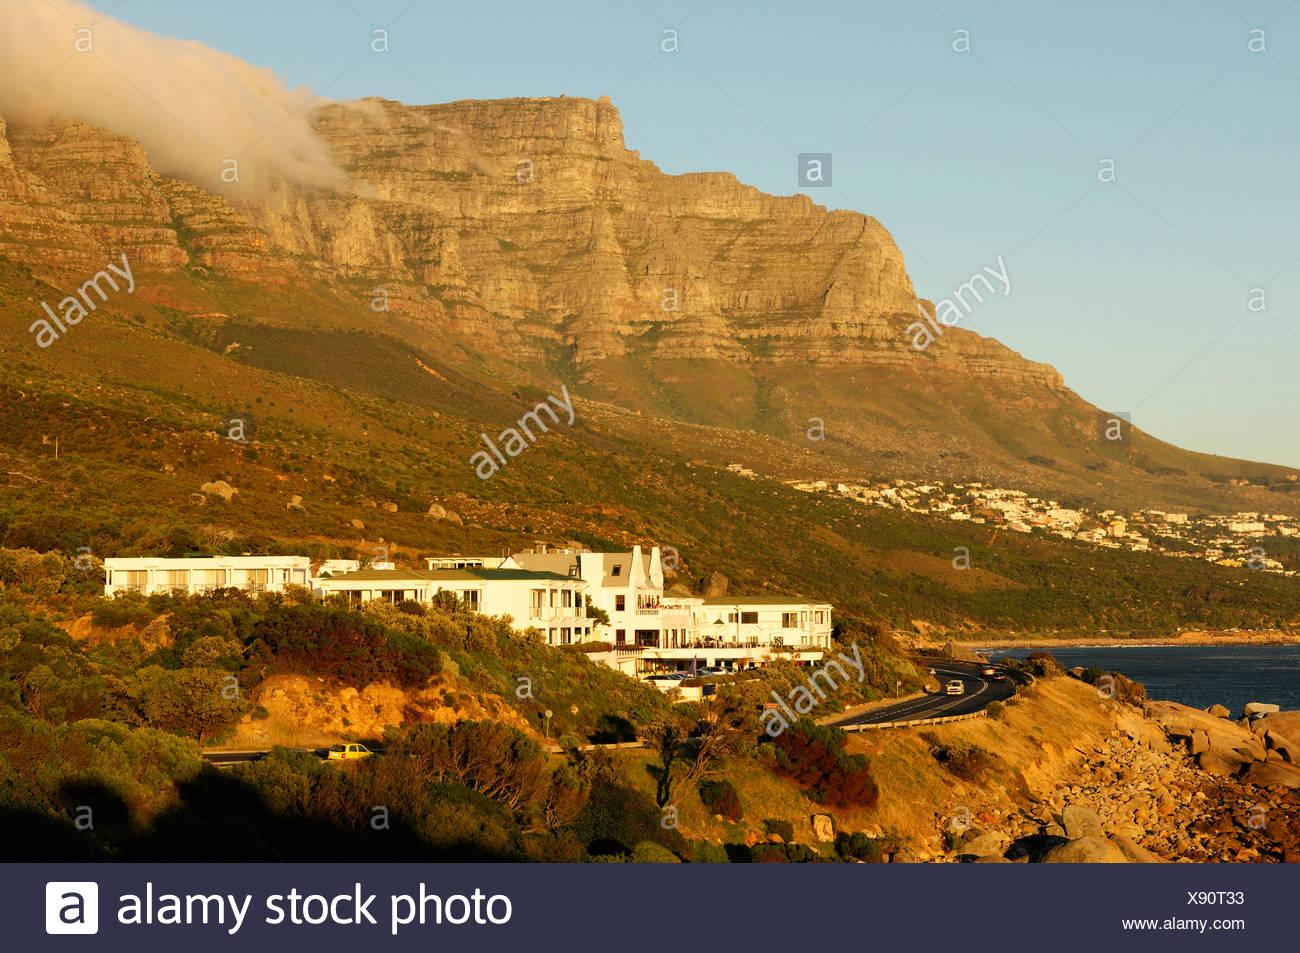 Twelve Apostles Hotel Camps Bay Cape Peninsula Western Cape South Africa coast ocean sea shore scenery mountain mountains - Stock Image